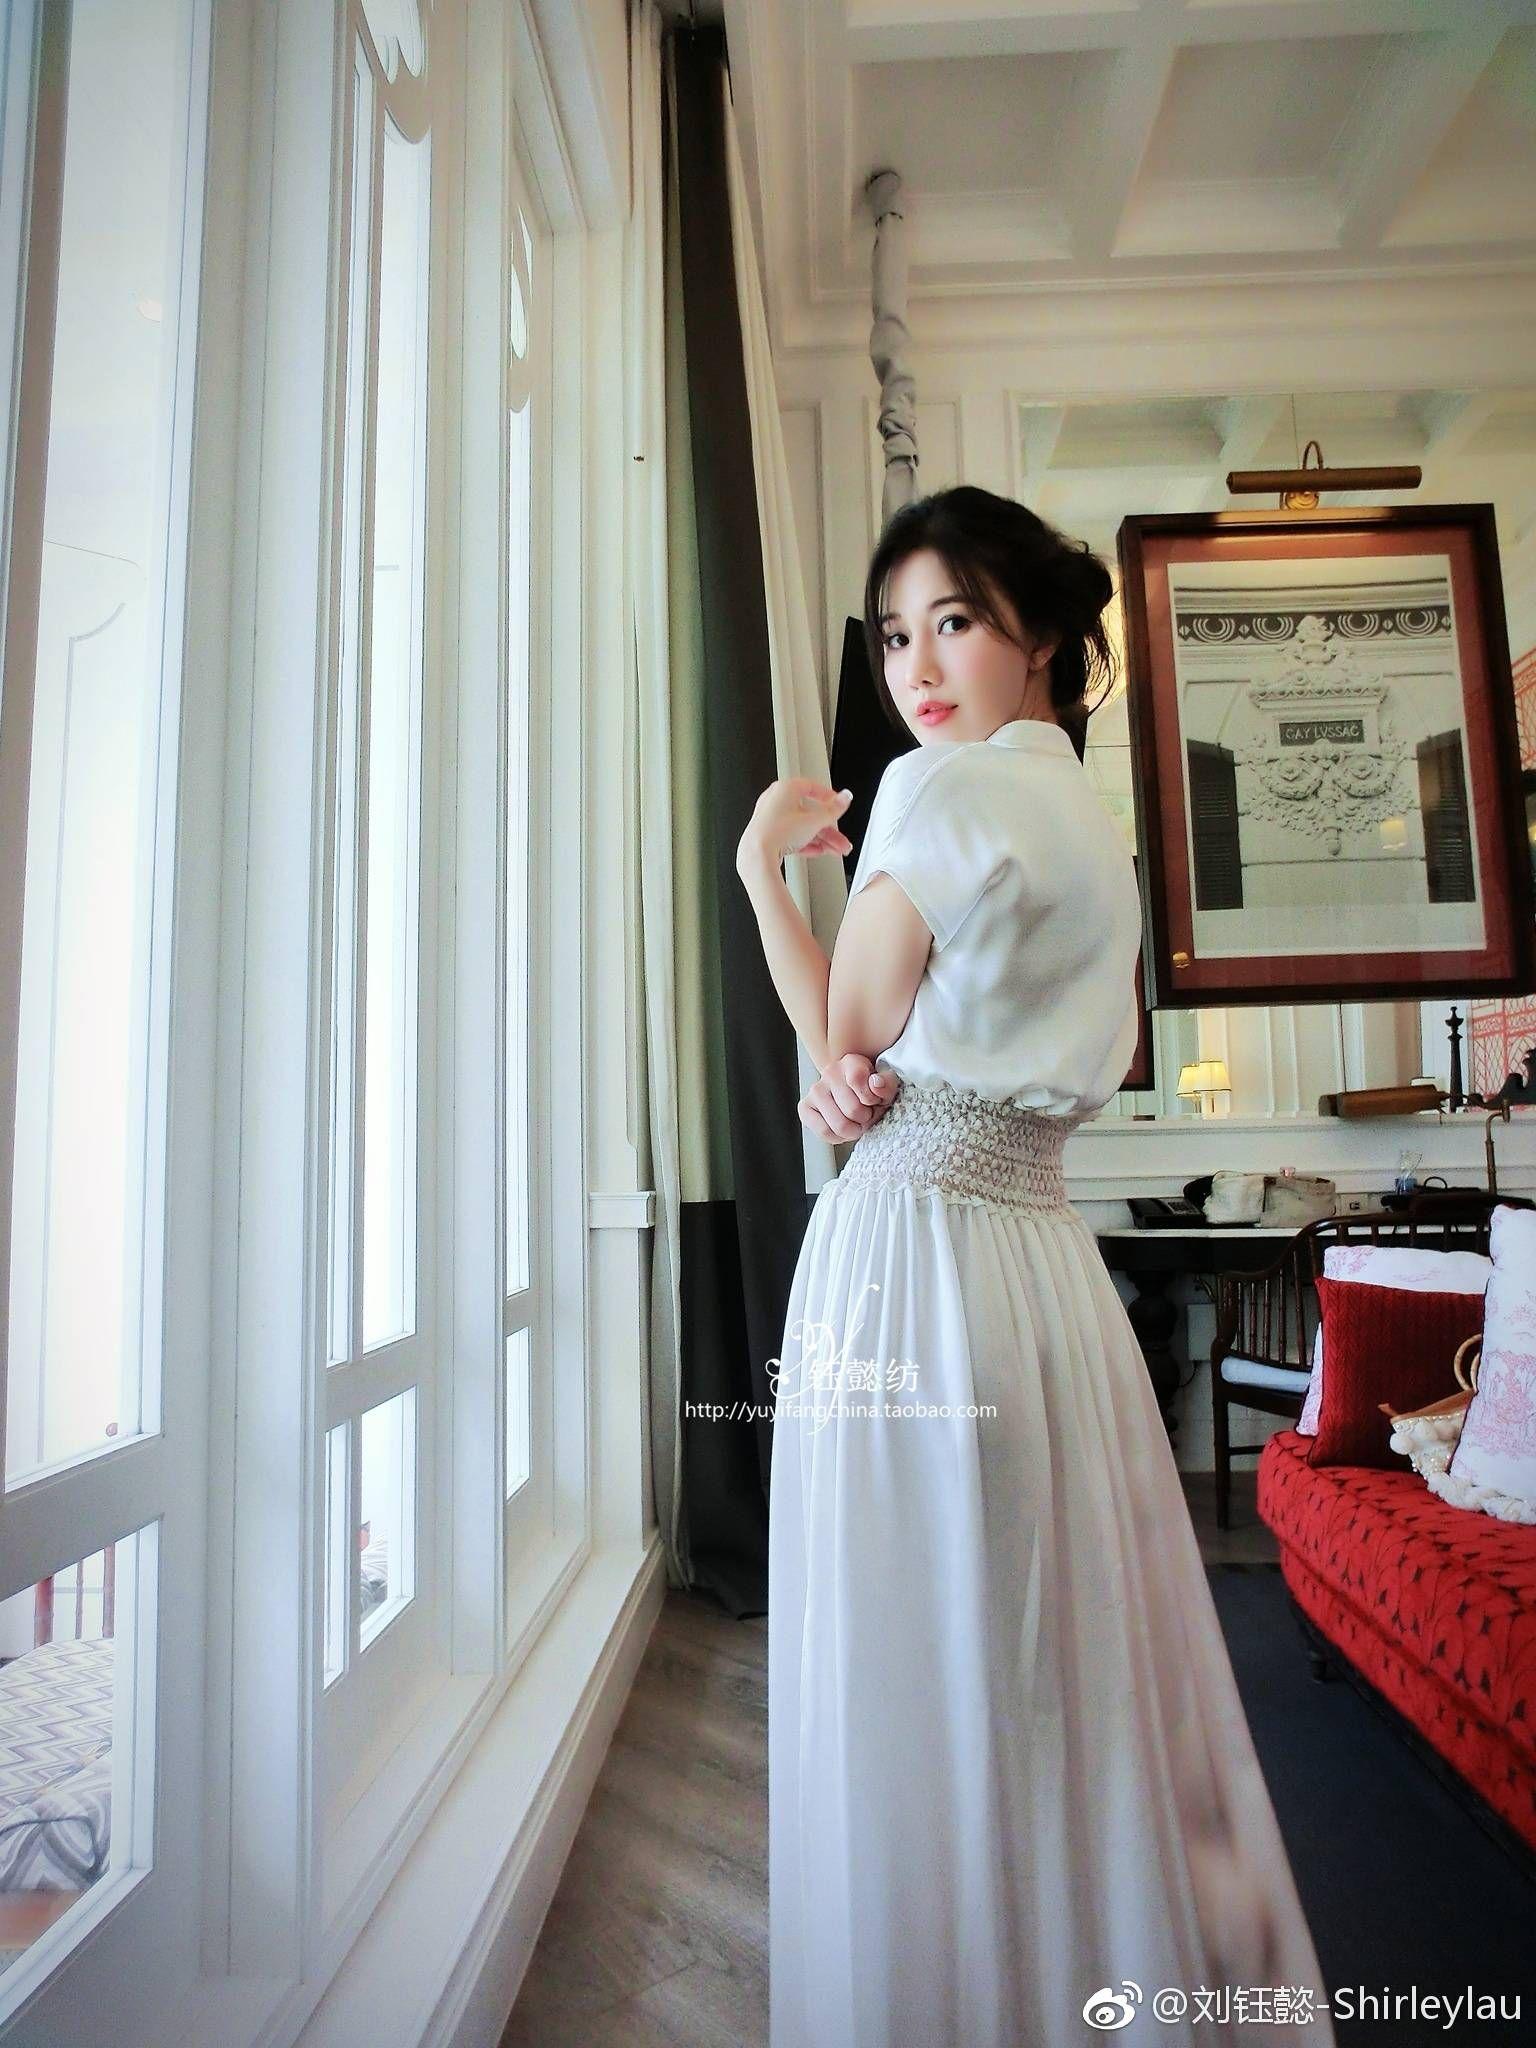 刘钰懿-Shirleylau http://weibo.com/1834946594/GurPU295D 1/4 ...